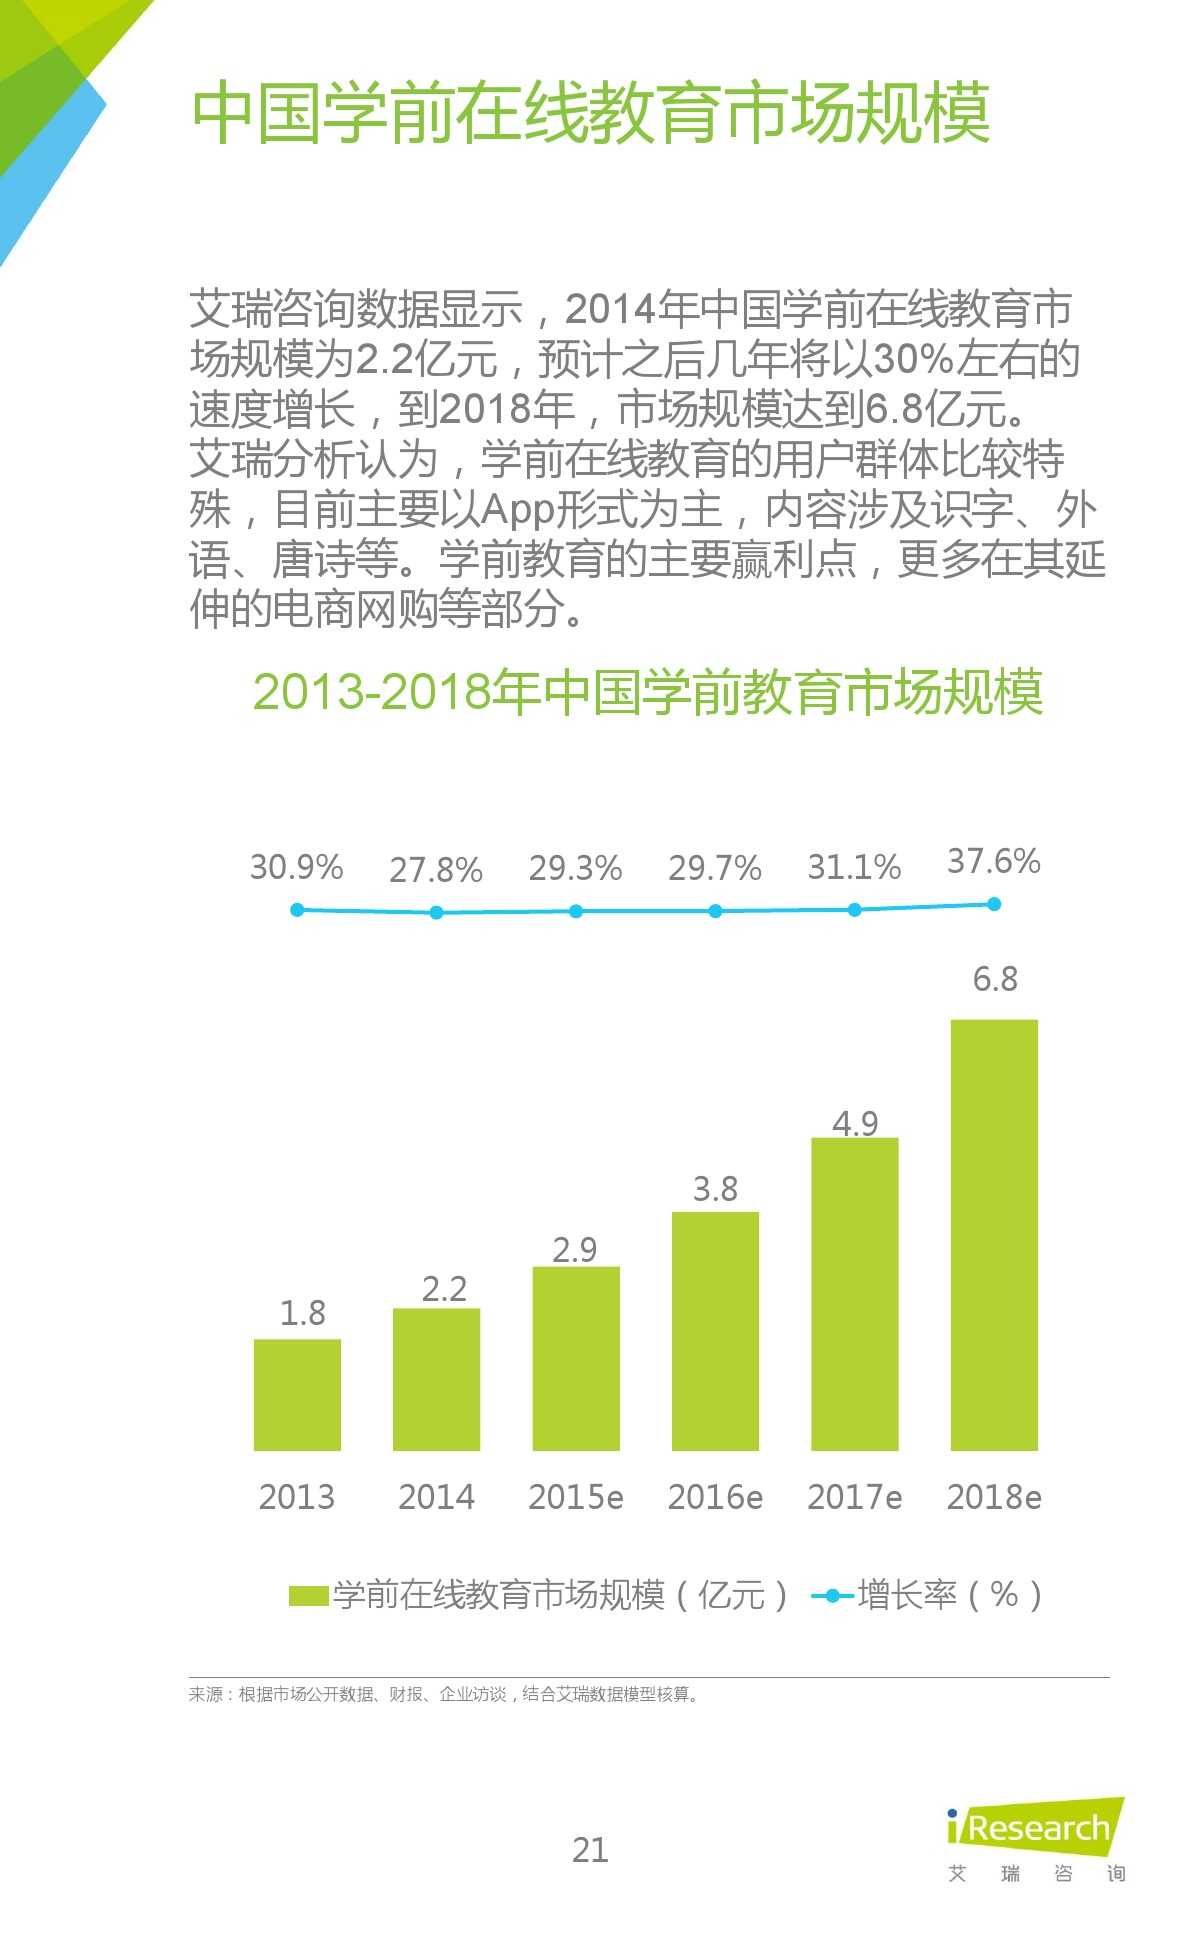 iResearch-2015年中国在线教育平台研究报告_000021